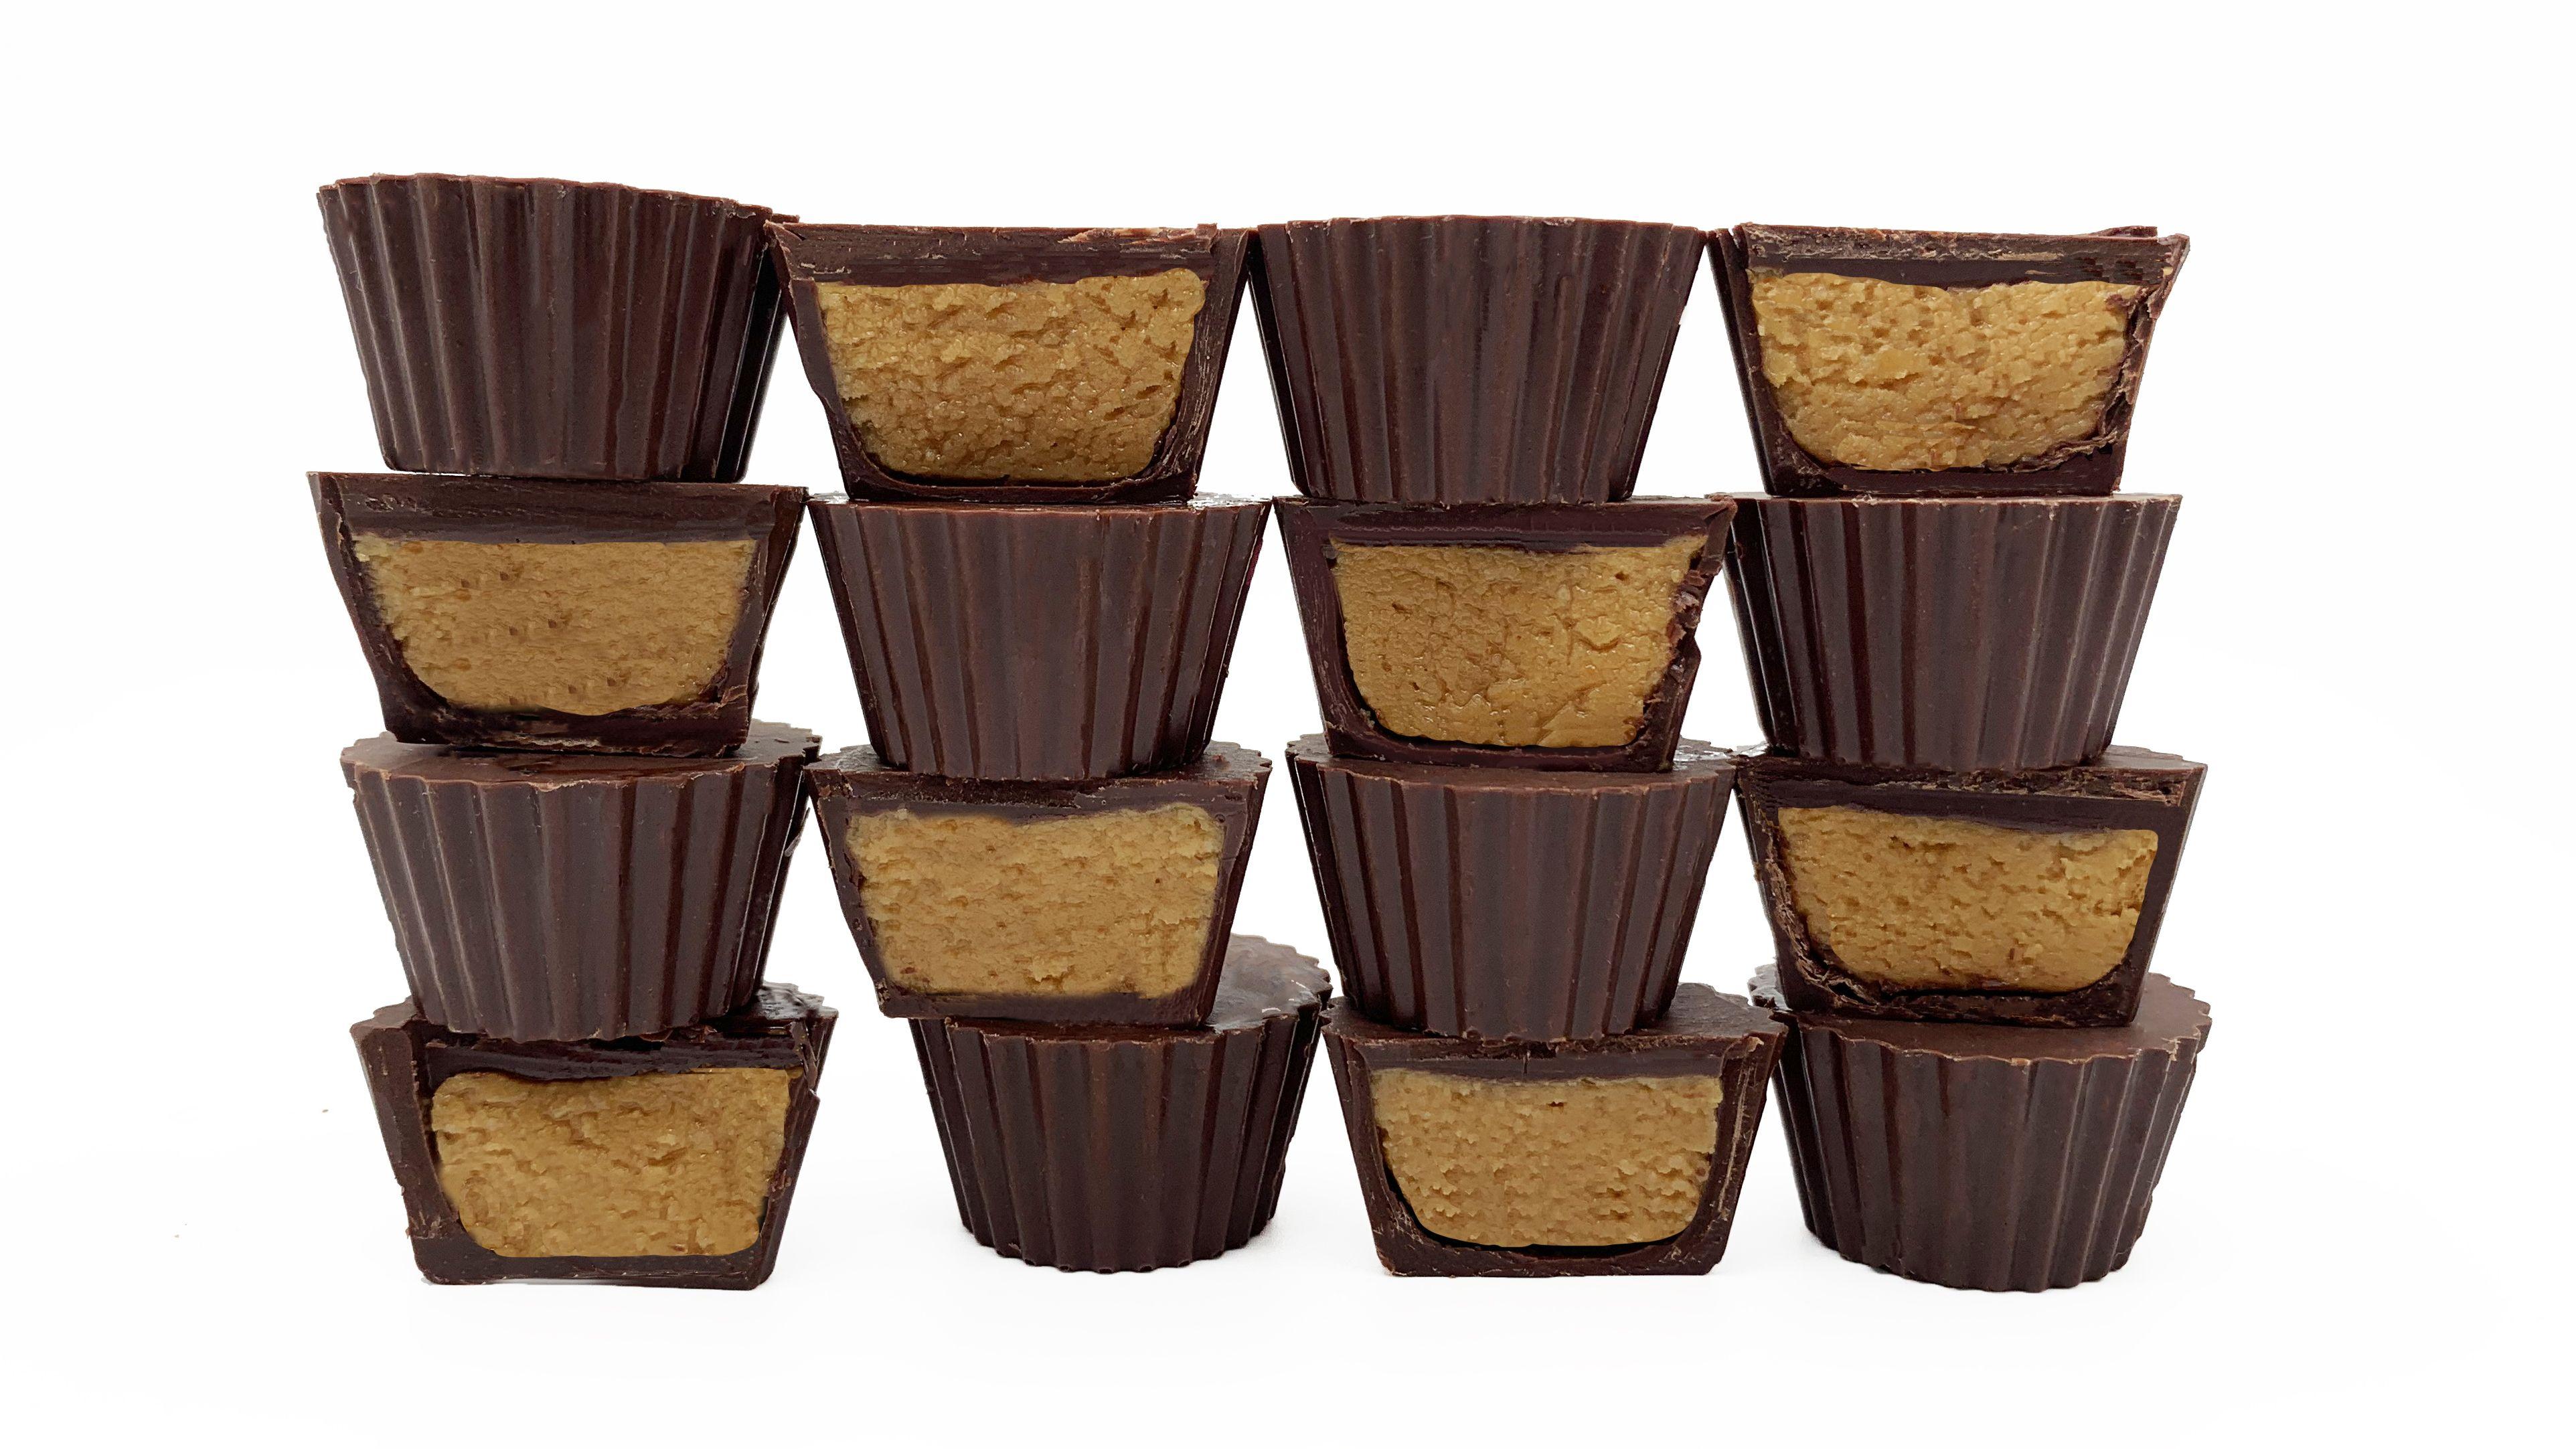 Vegan Peanut Butter Cups in 2020 Vegan peanut butter